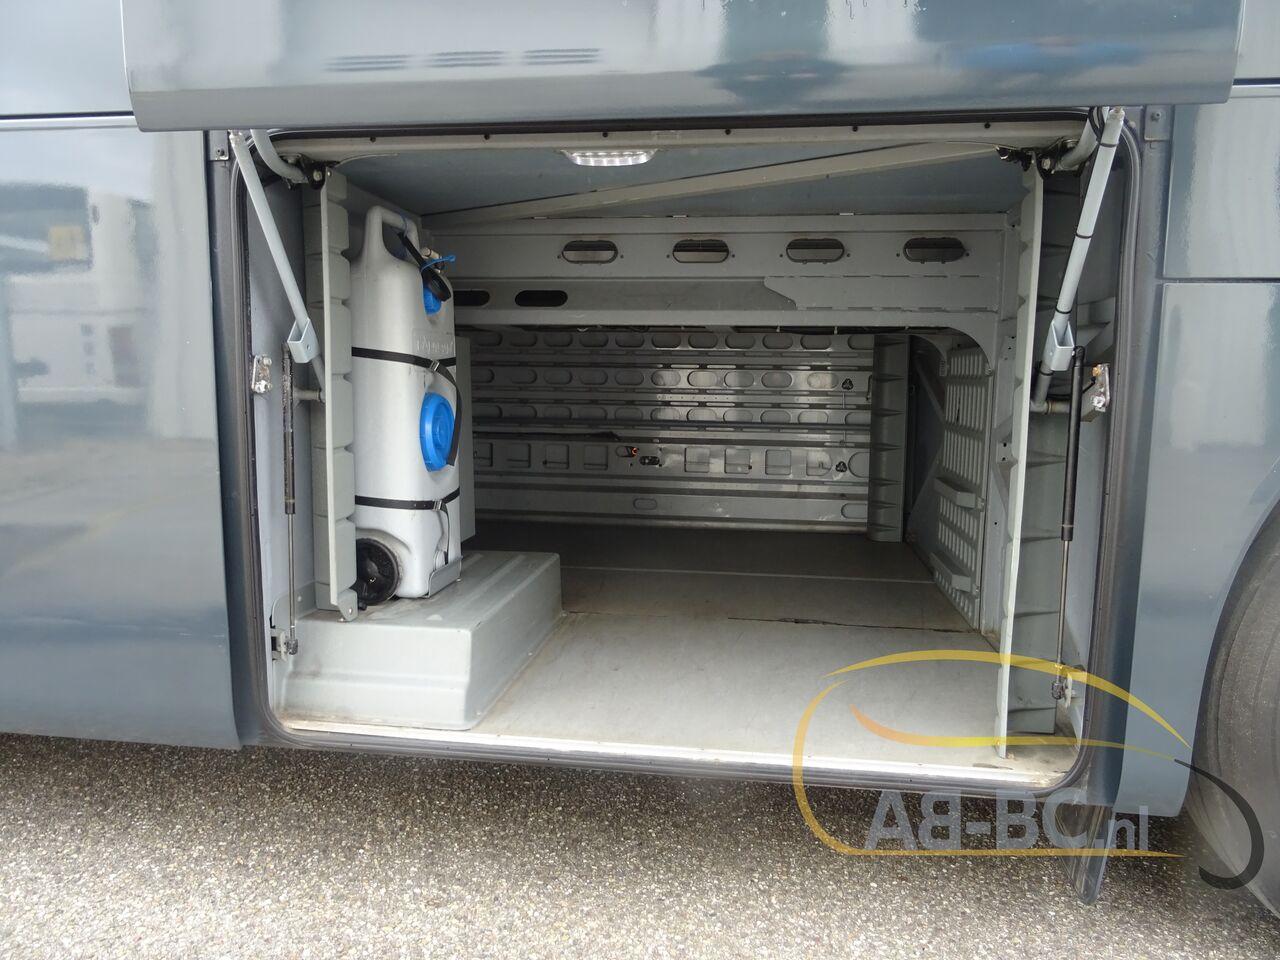 coach-busSETRA-S415-GT-HD-FINAL-EDITION---1627456895078057271_big_cd22b4425366302b70747737128be294--21050713010665719300